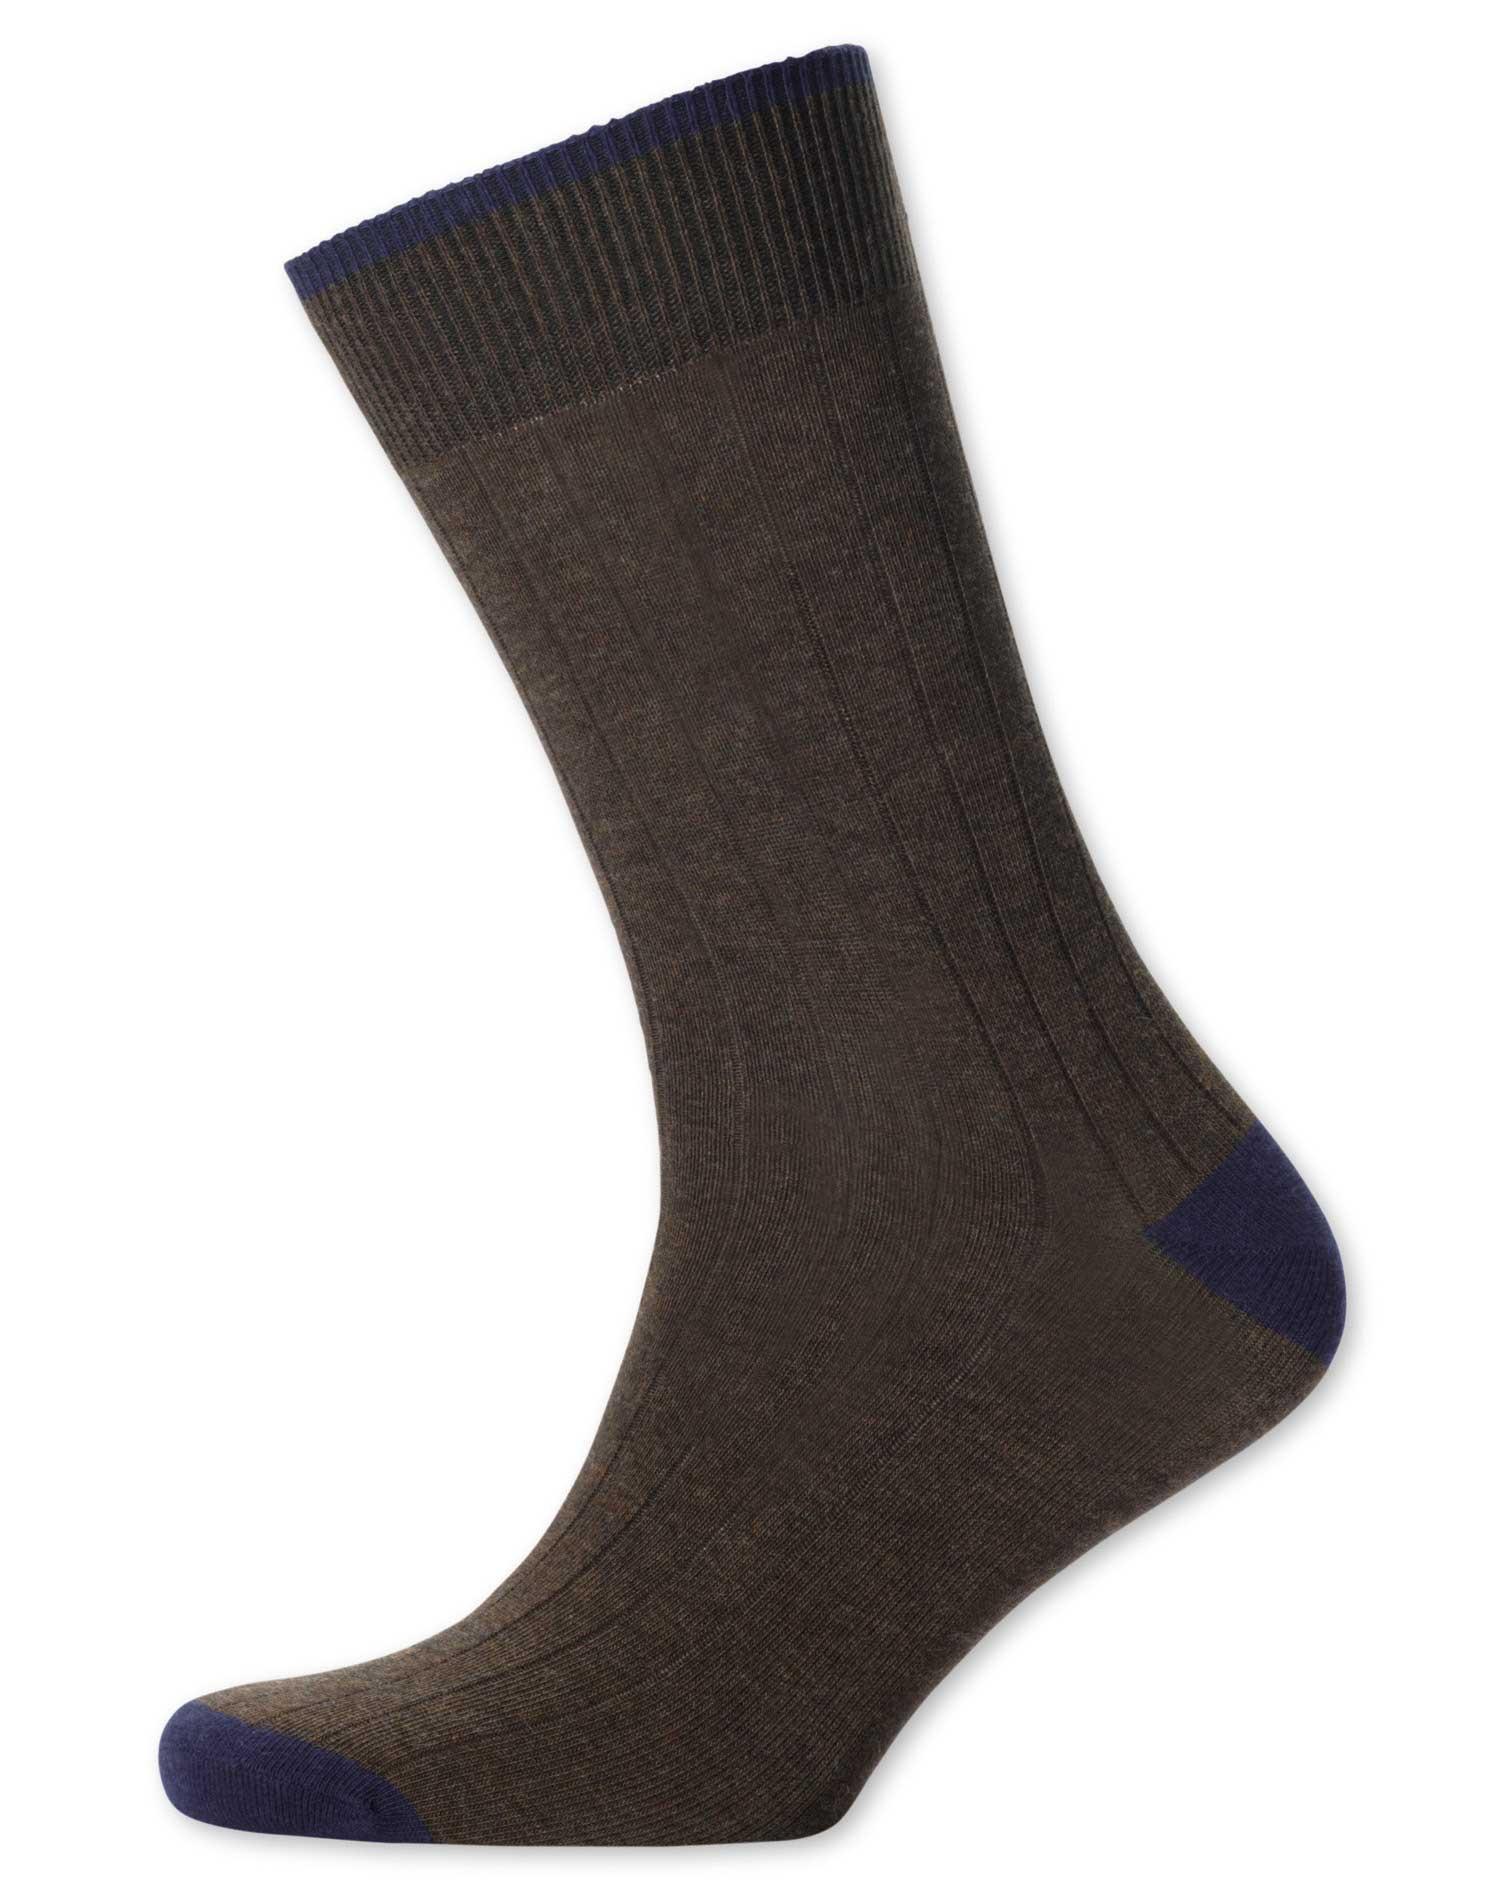 Brown Ribbed Socks Size Medium by Charles Tyrwhitt